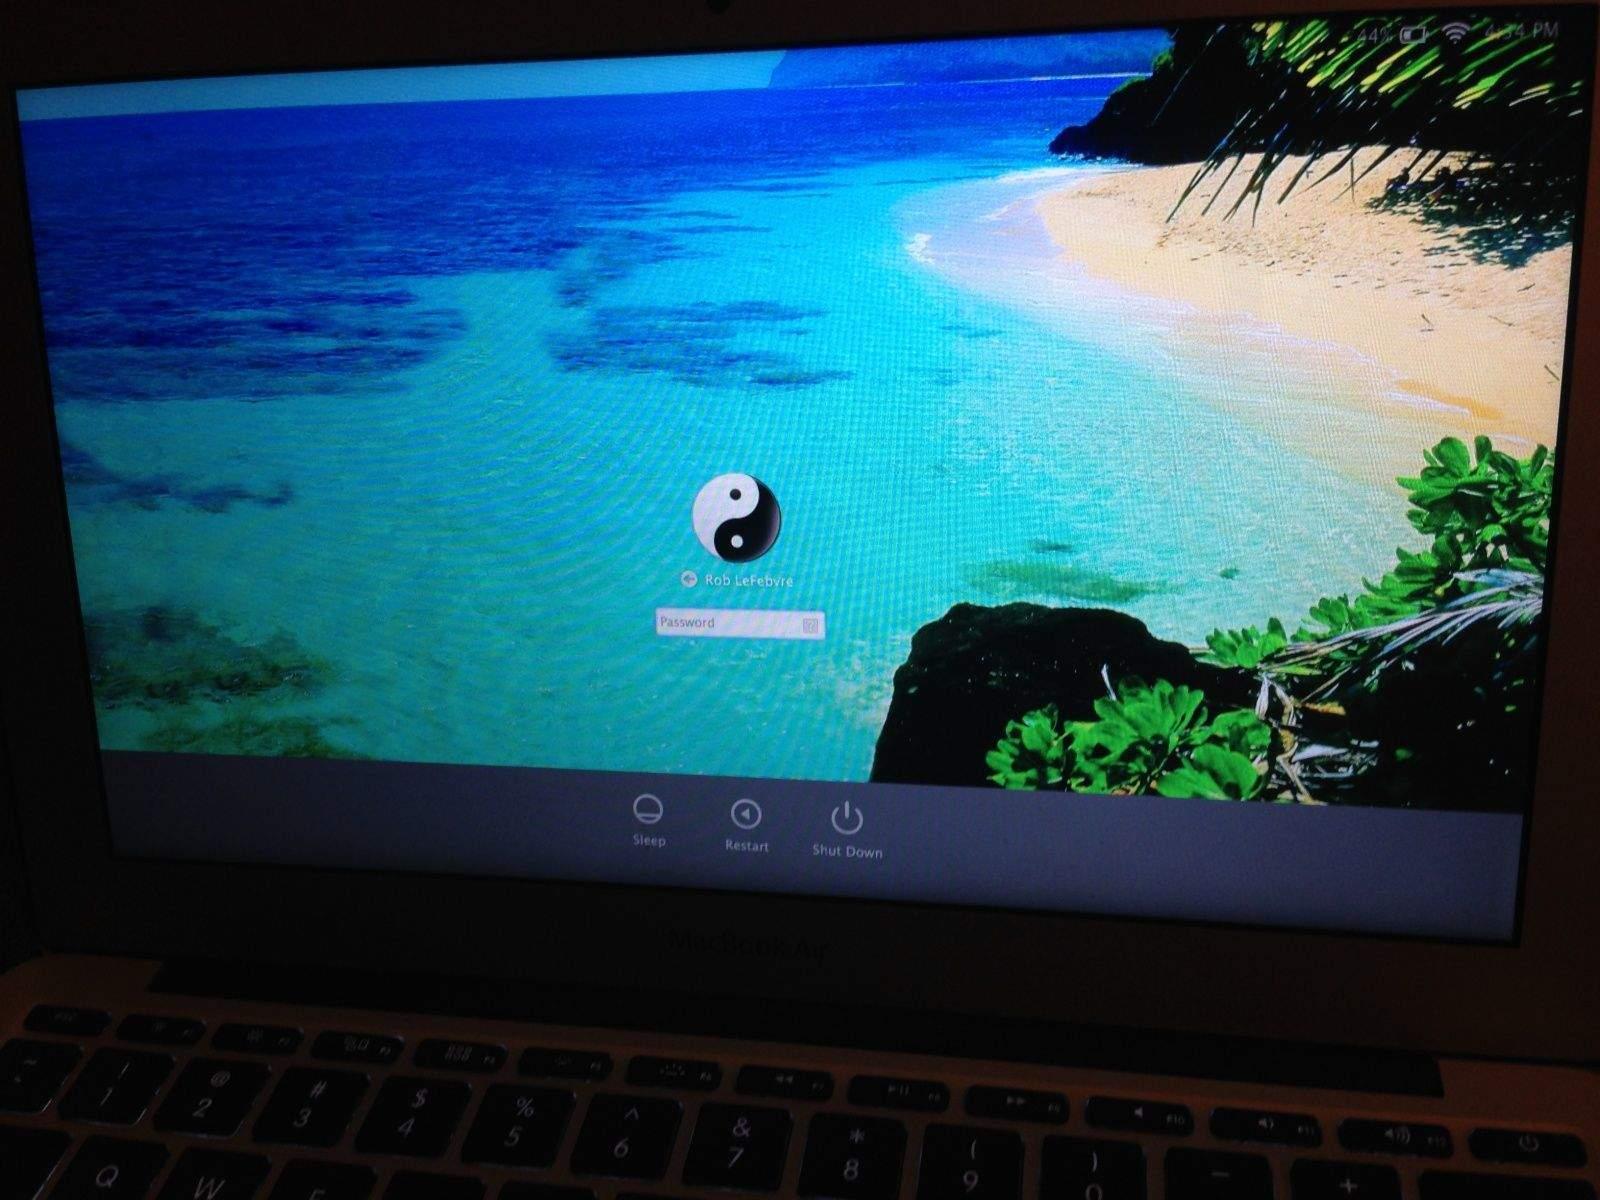 prettier than linen: change the login screen wallpaper in os x